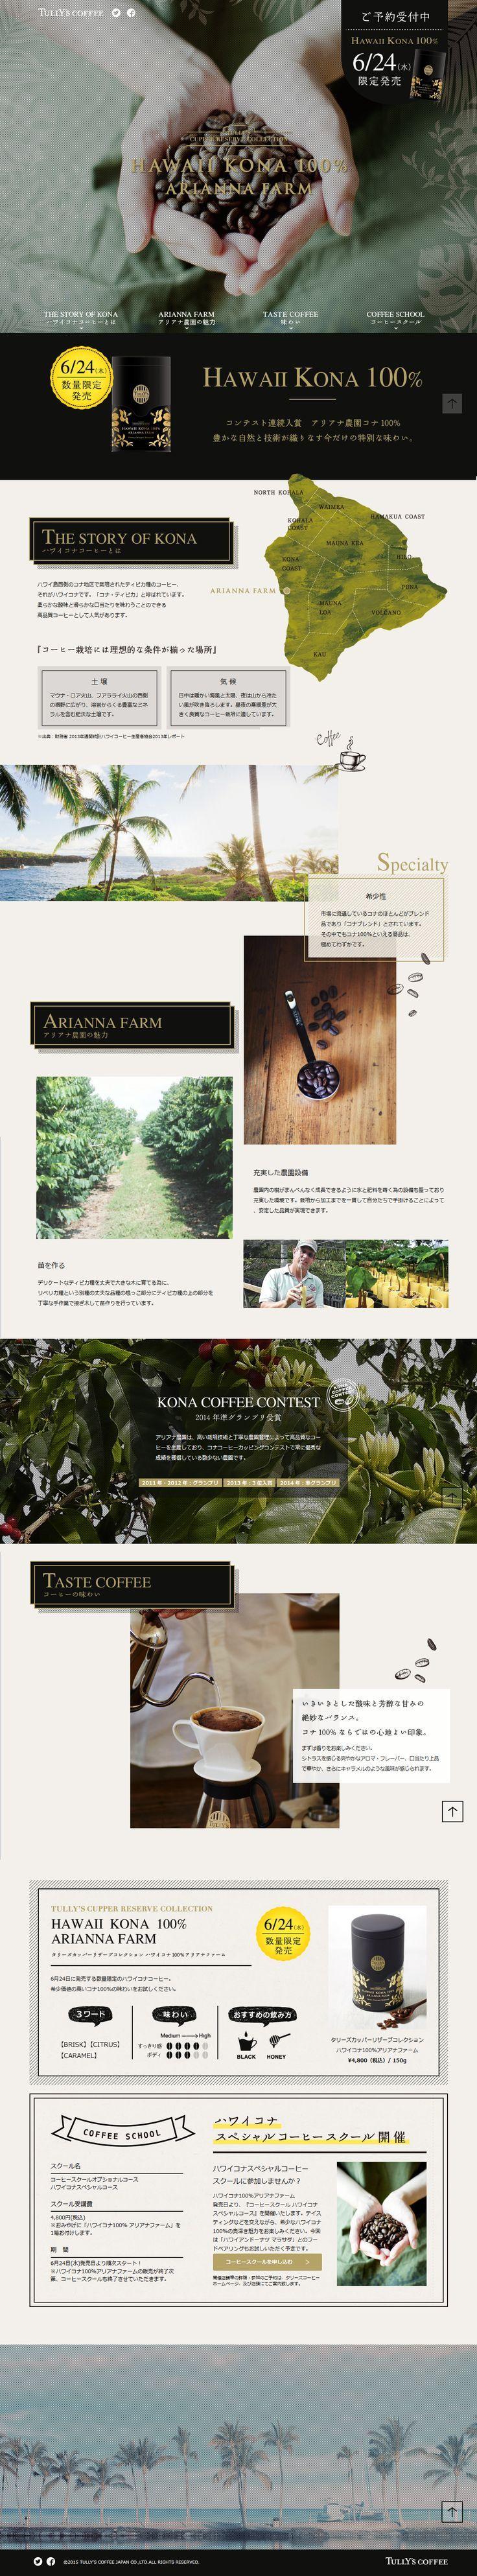 Tully's Coffee Web Design